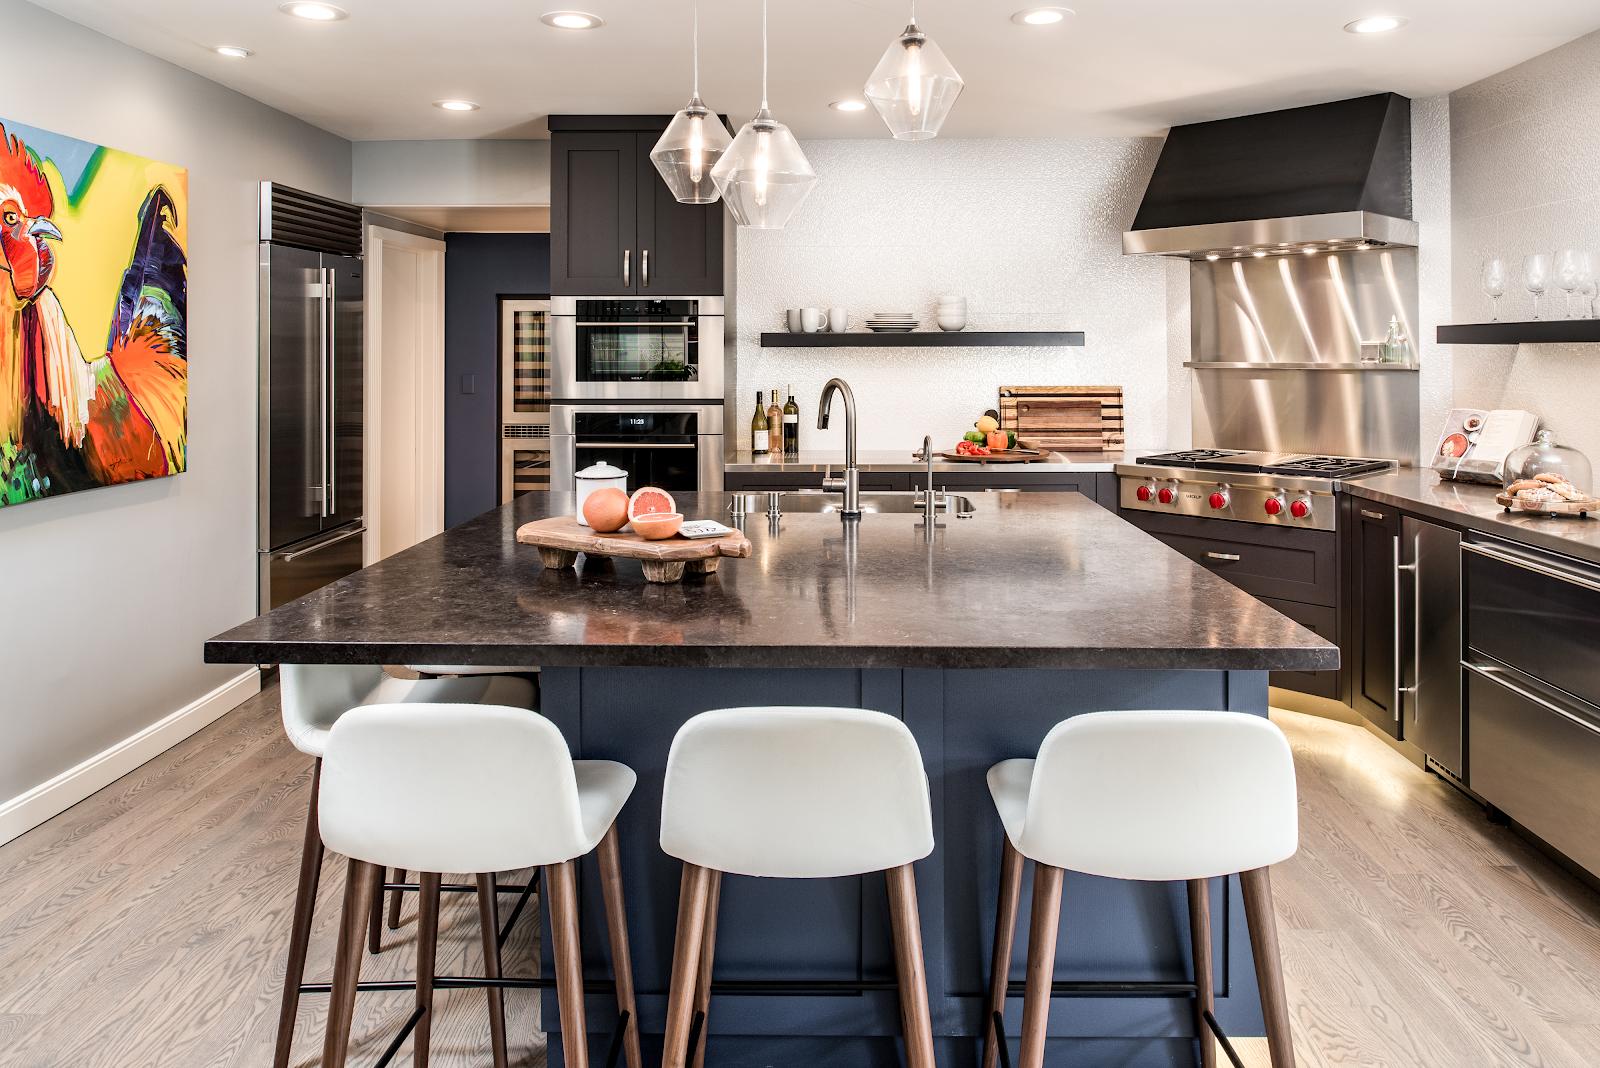 4 examples to create good modular kitchen designs